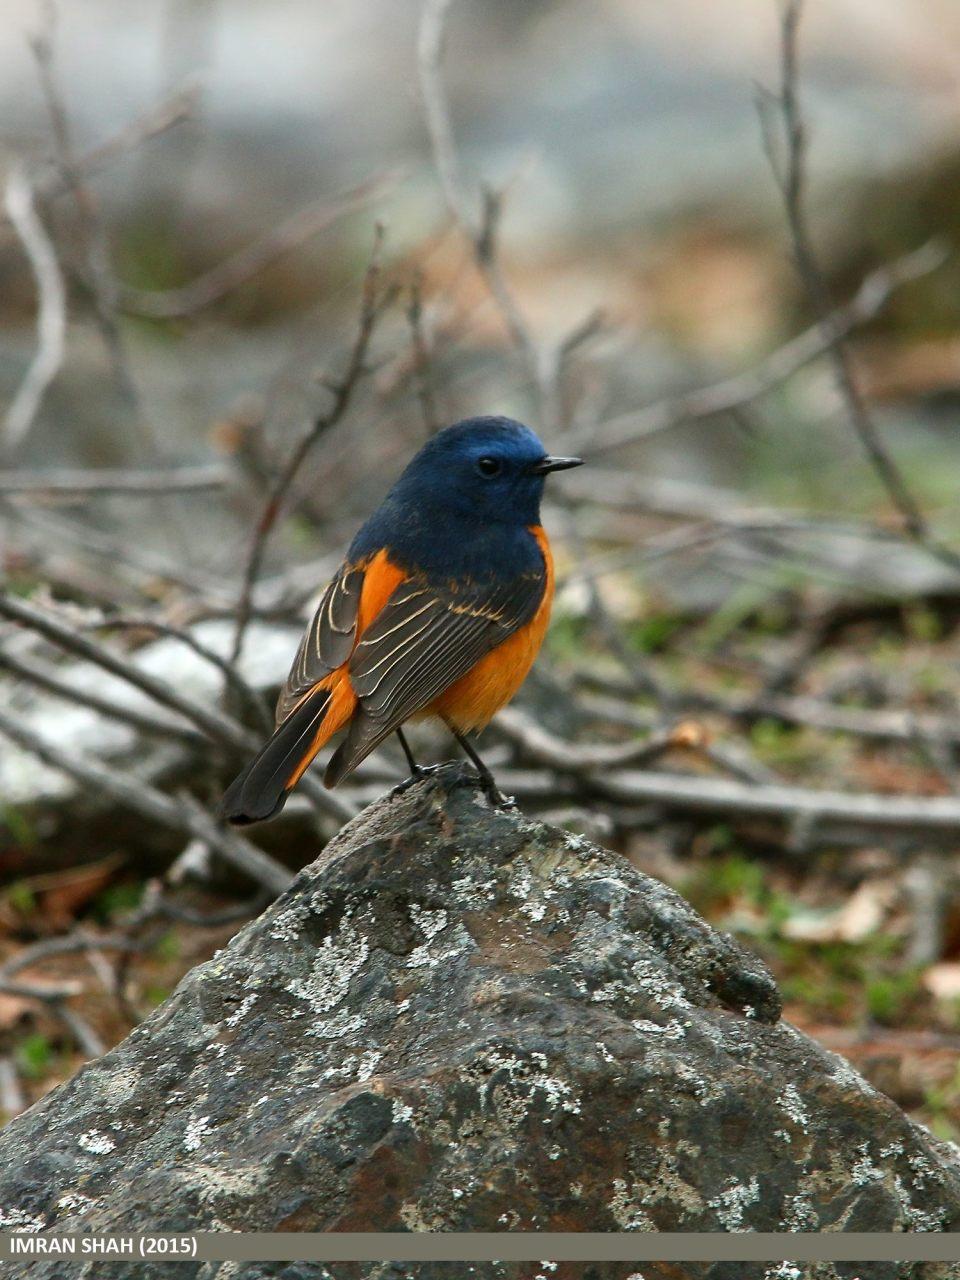 Blue-fronted Redstart (Phoenicurus frontalis) captured at Naltar, Gilgit, Gilgit-Baltistan, Pakistan